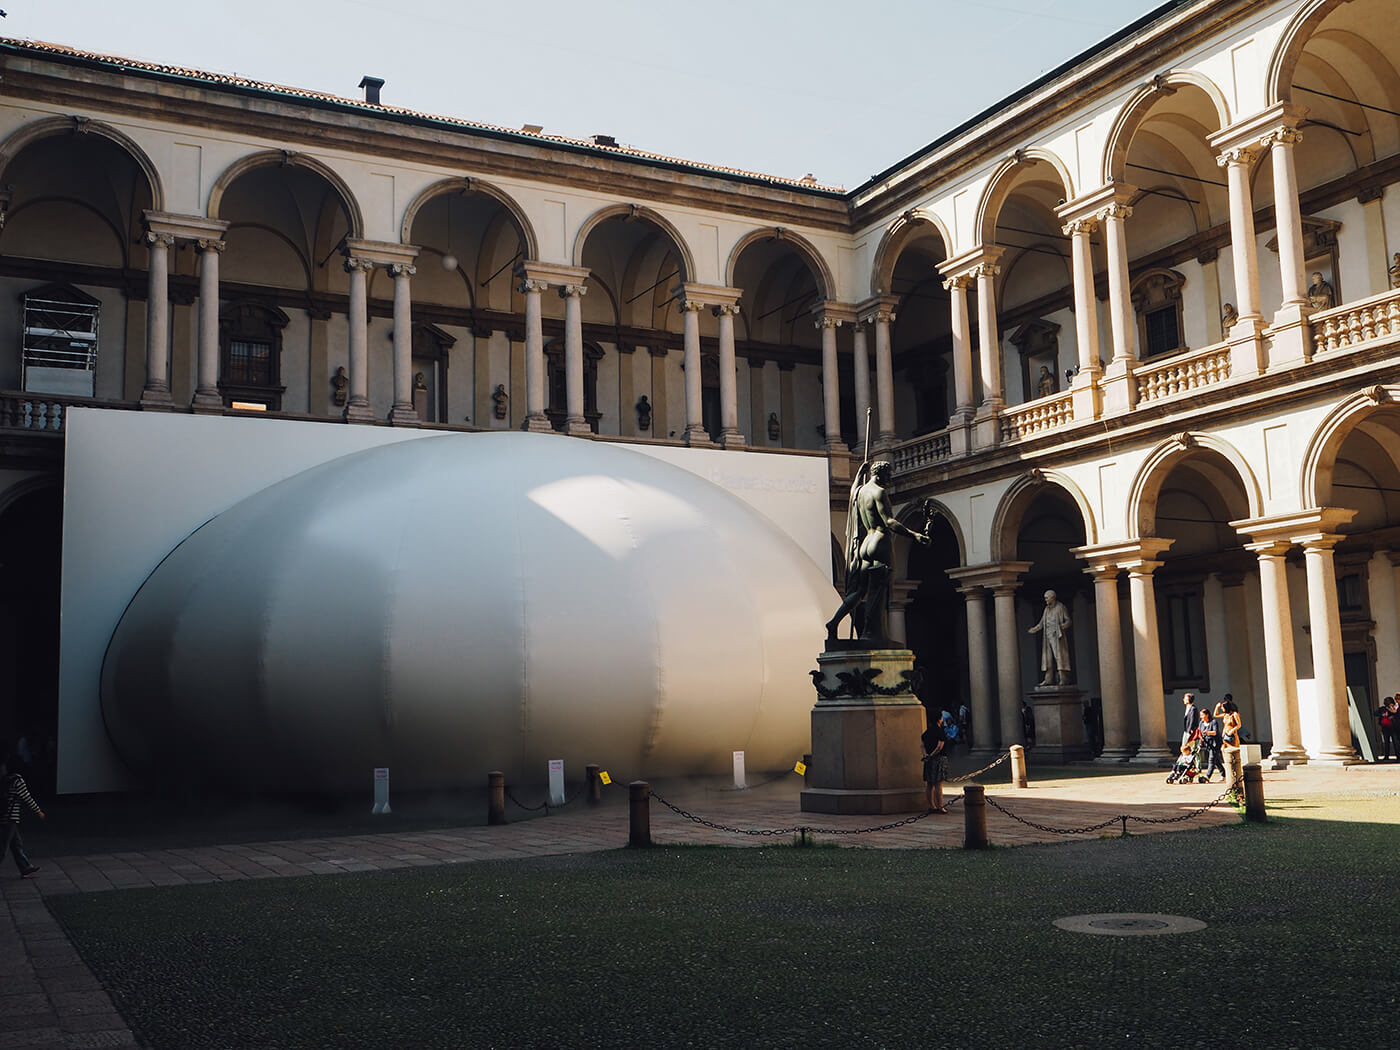 Installation Panasonic Milan Design Week 2018 - FrenchyFancy